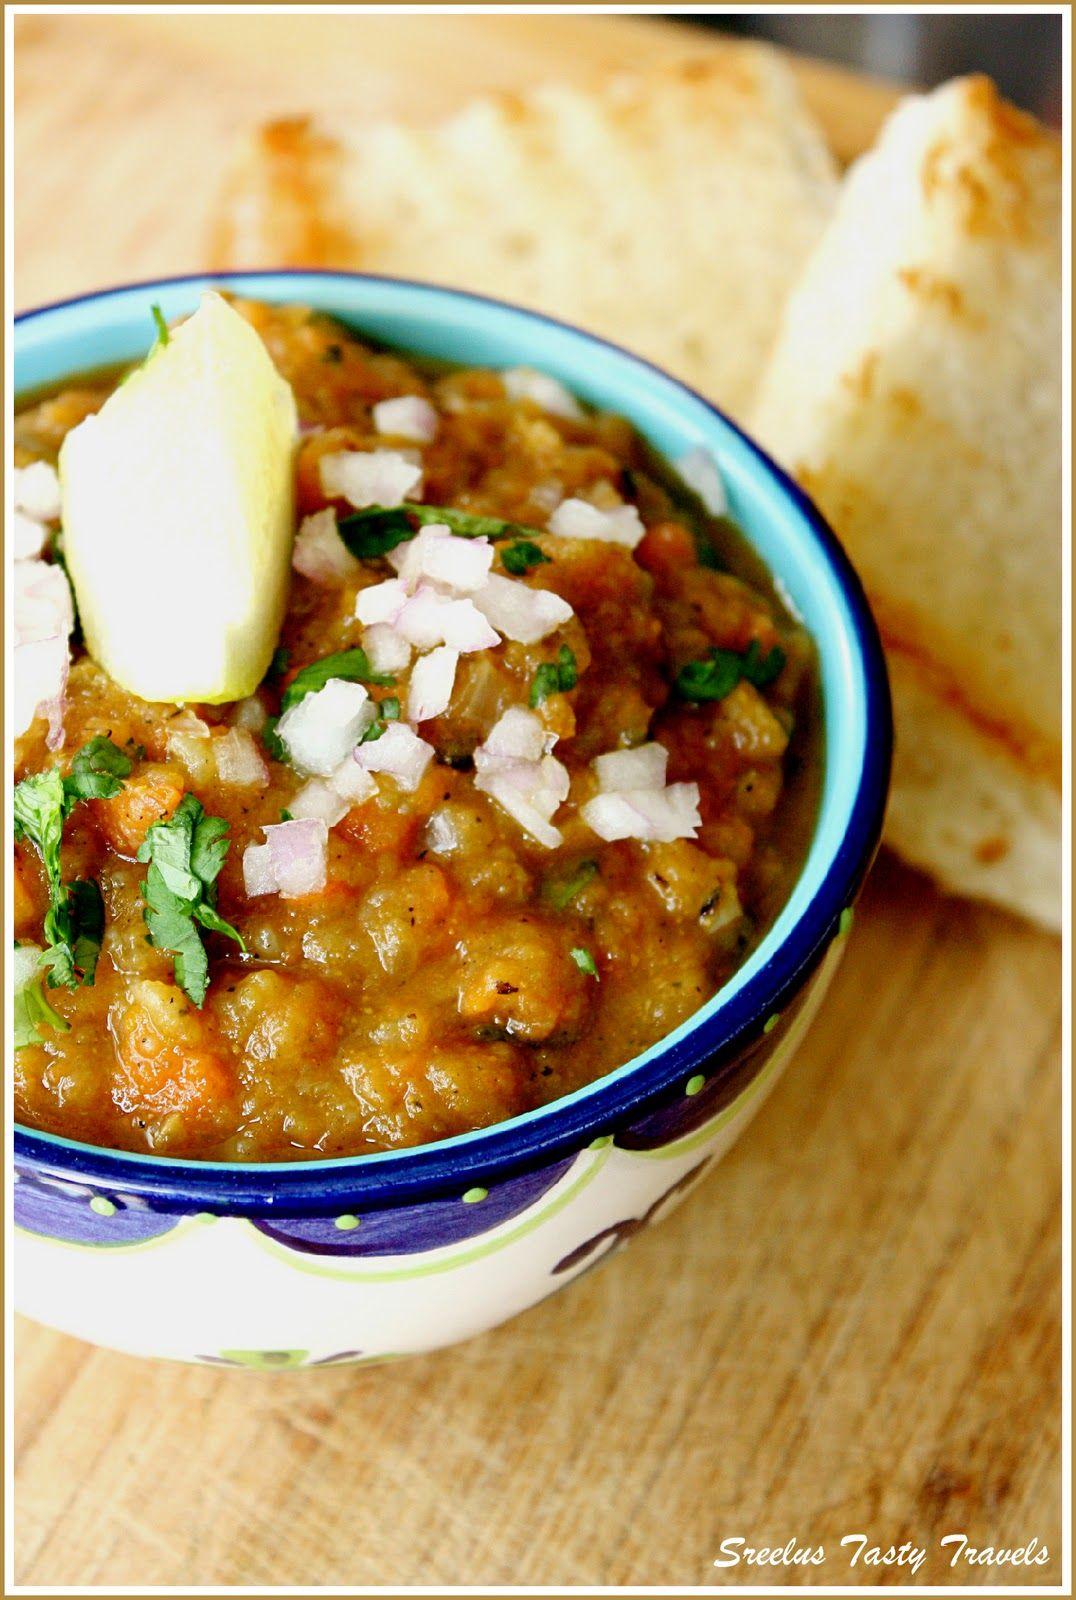 Sreelus tasty travels farmers market buy pav bhaaji recipes recipes forumfinder Images